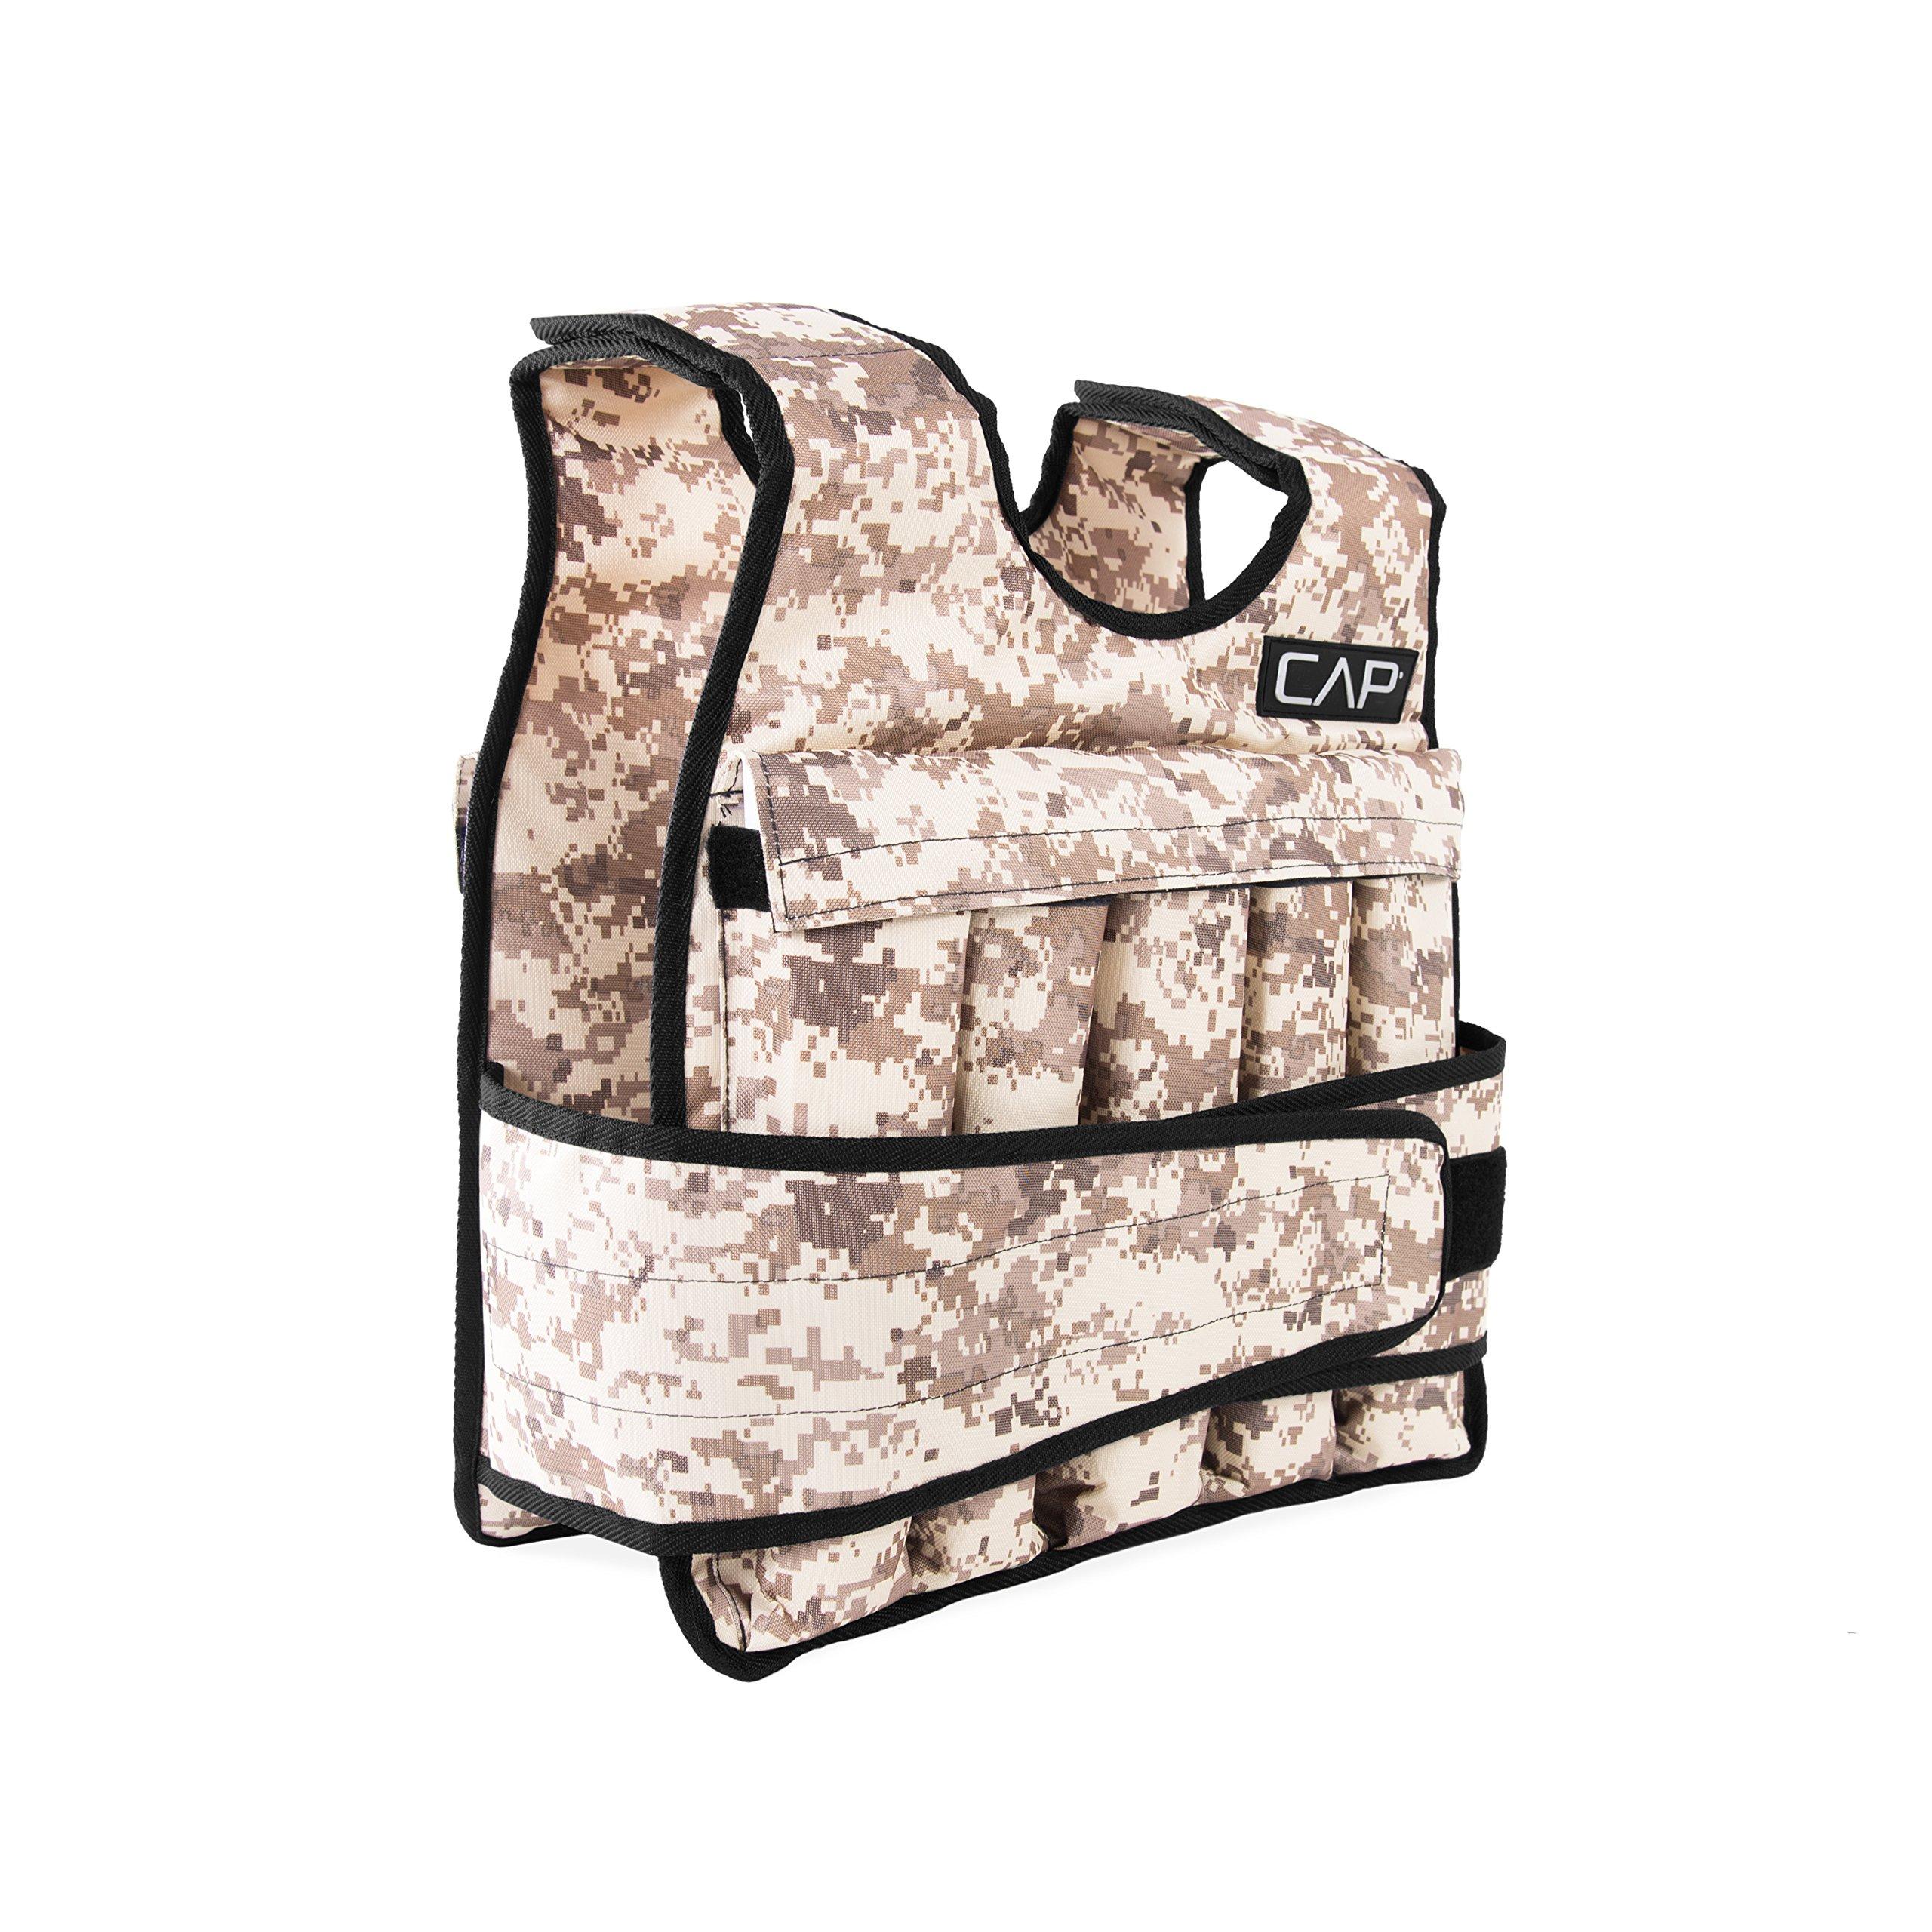 CAP Barbell 40 Lb Cap Adjustable Weighted Vest, Light Brown Camo